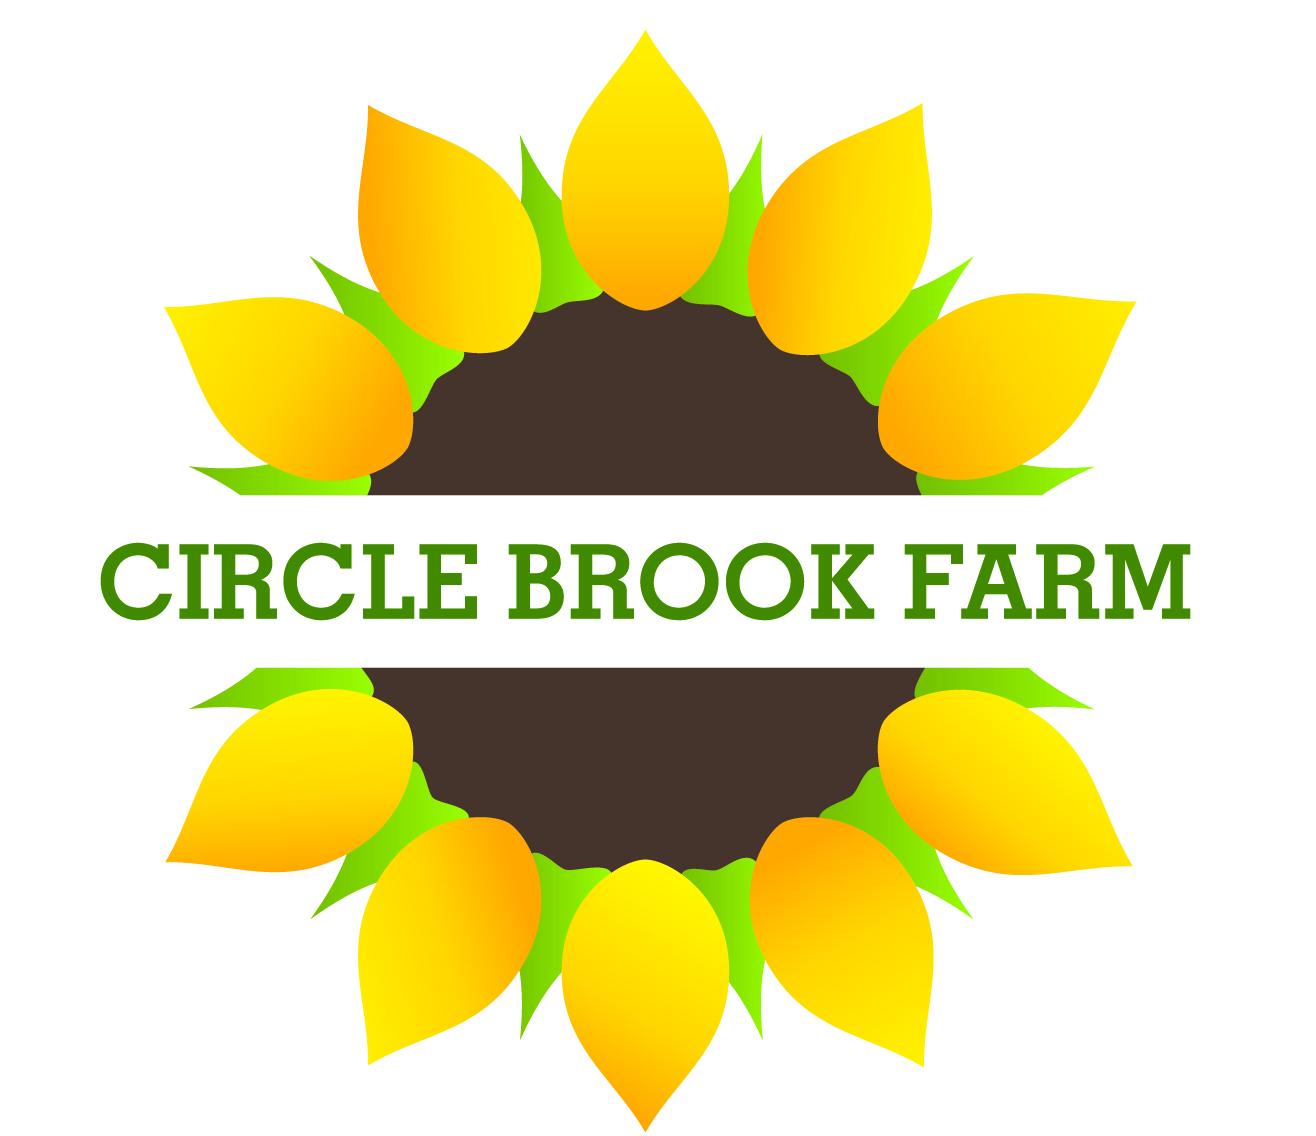 CircleBrookFarm_concept.jpg